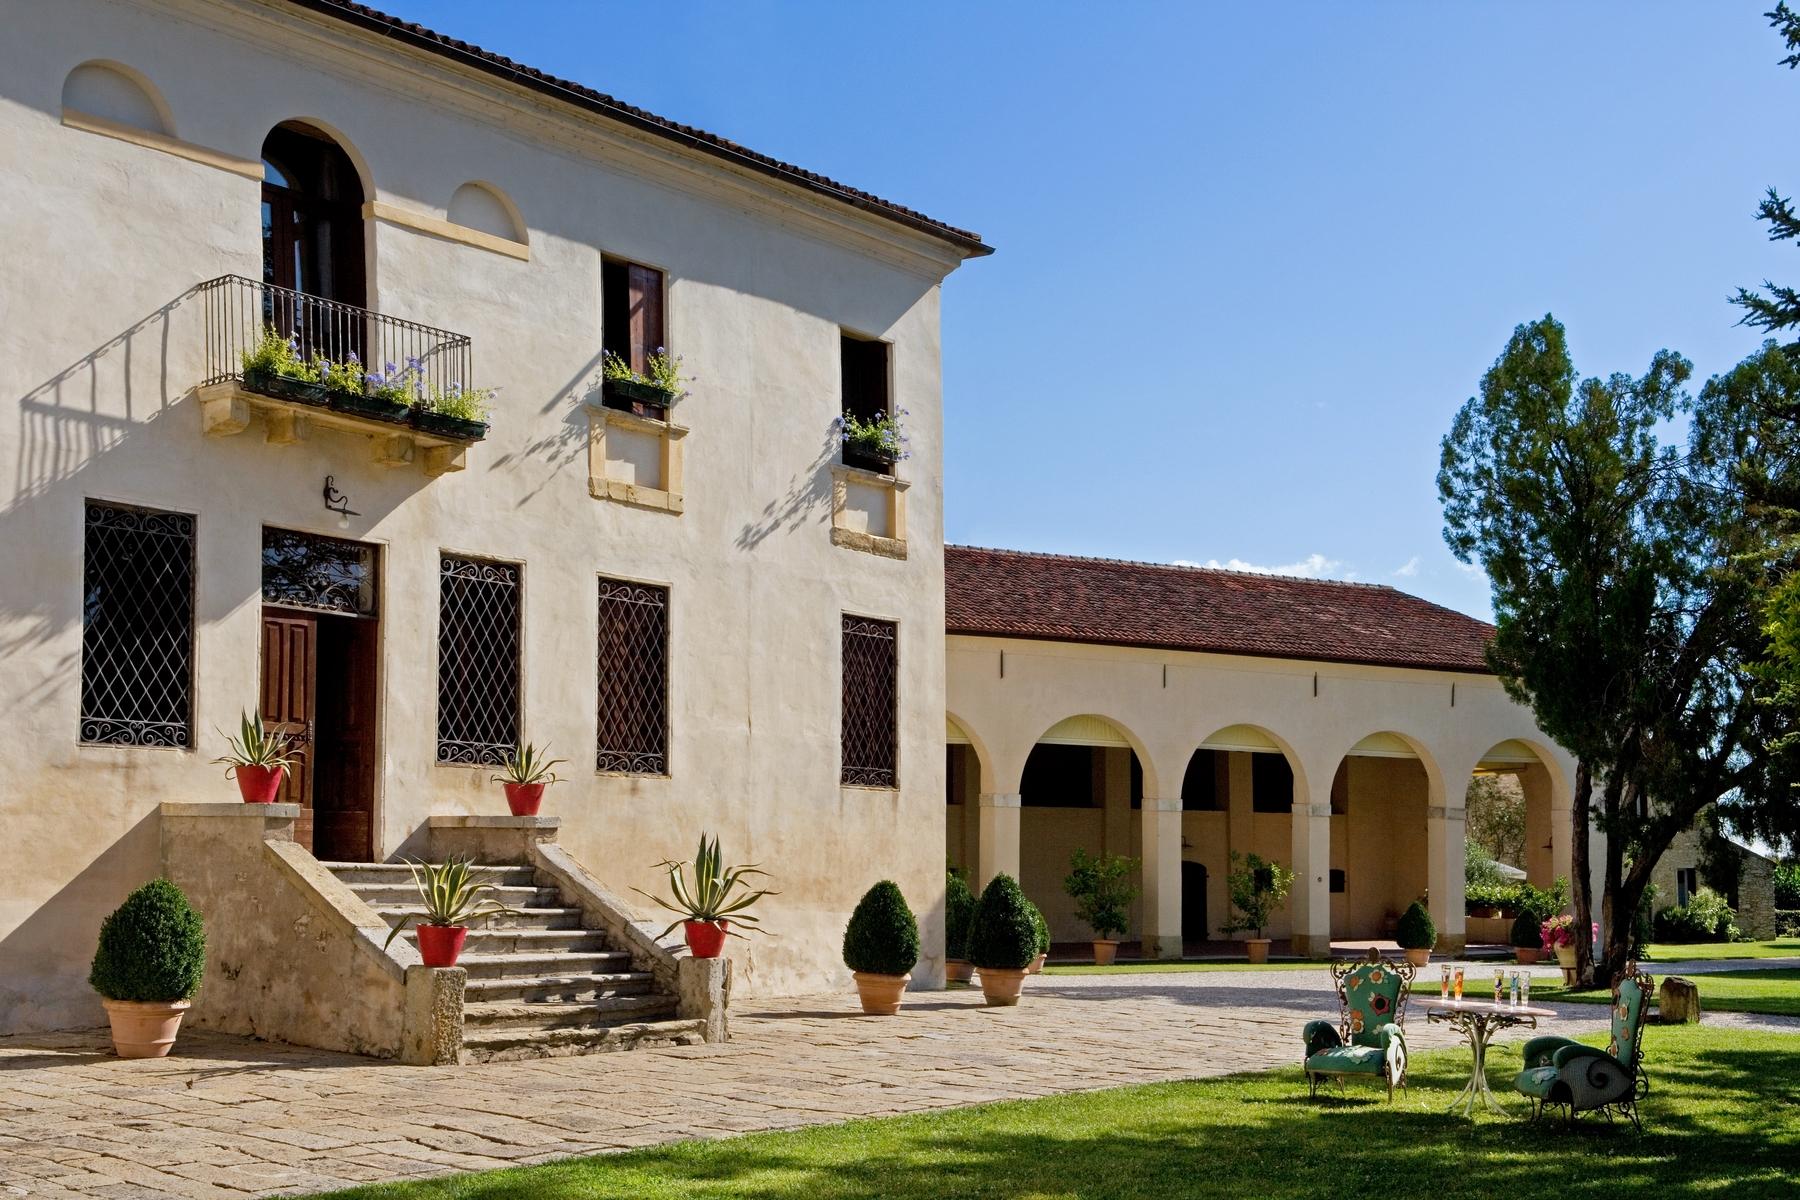 Single Family Home for Sale at Stunnig Venetian Villa Barbarano Vicentino, Vicenza Italy